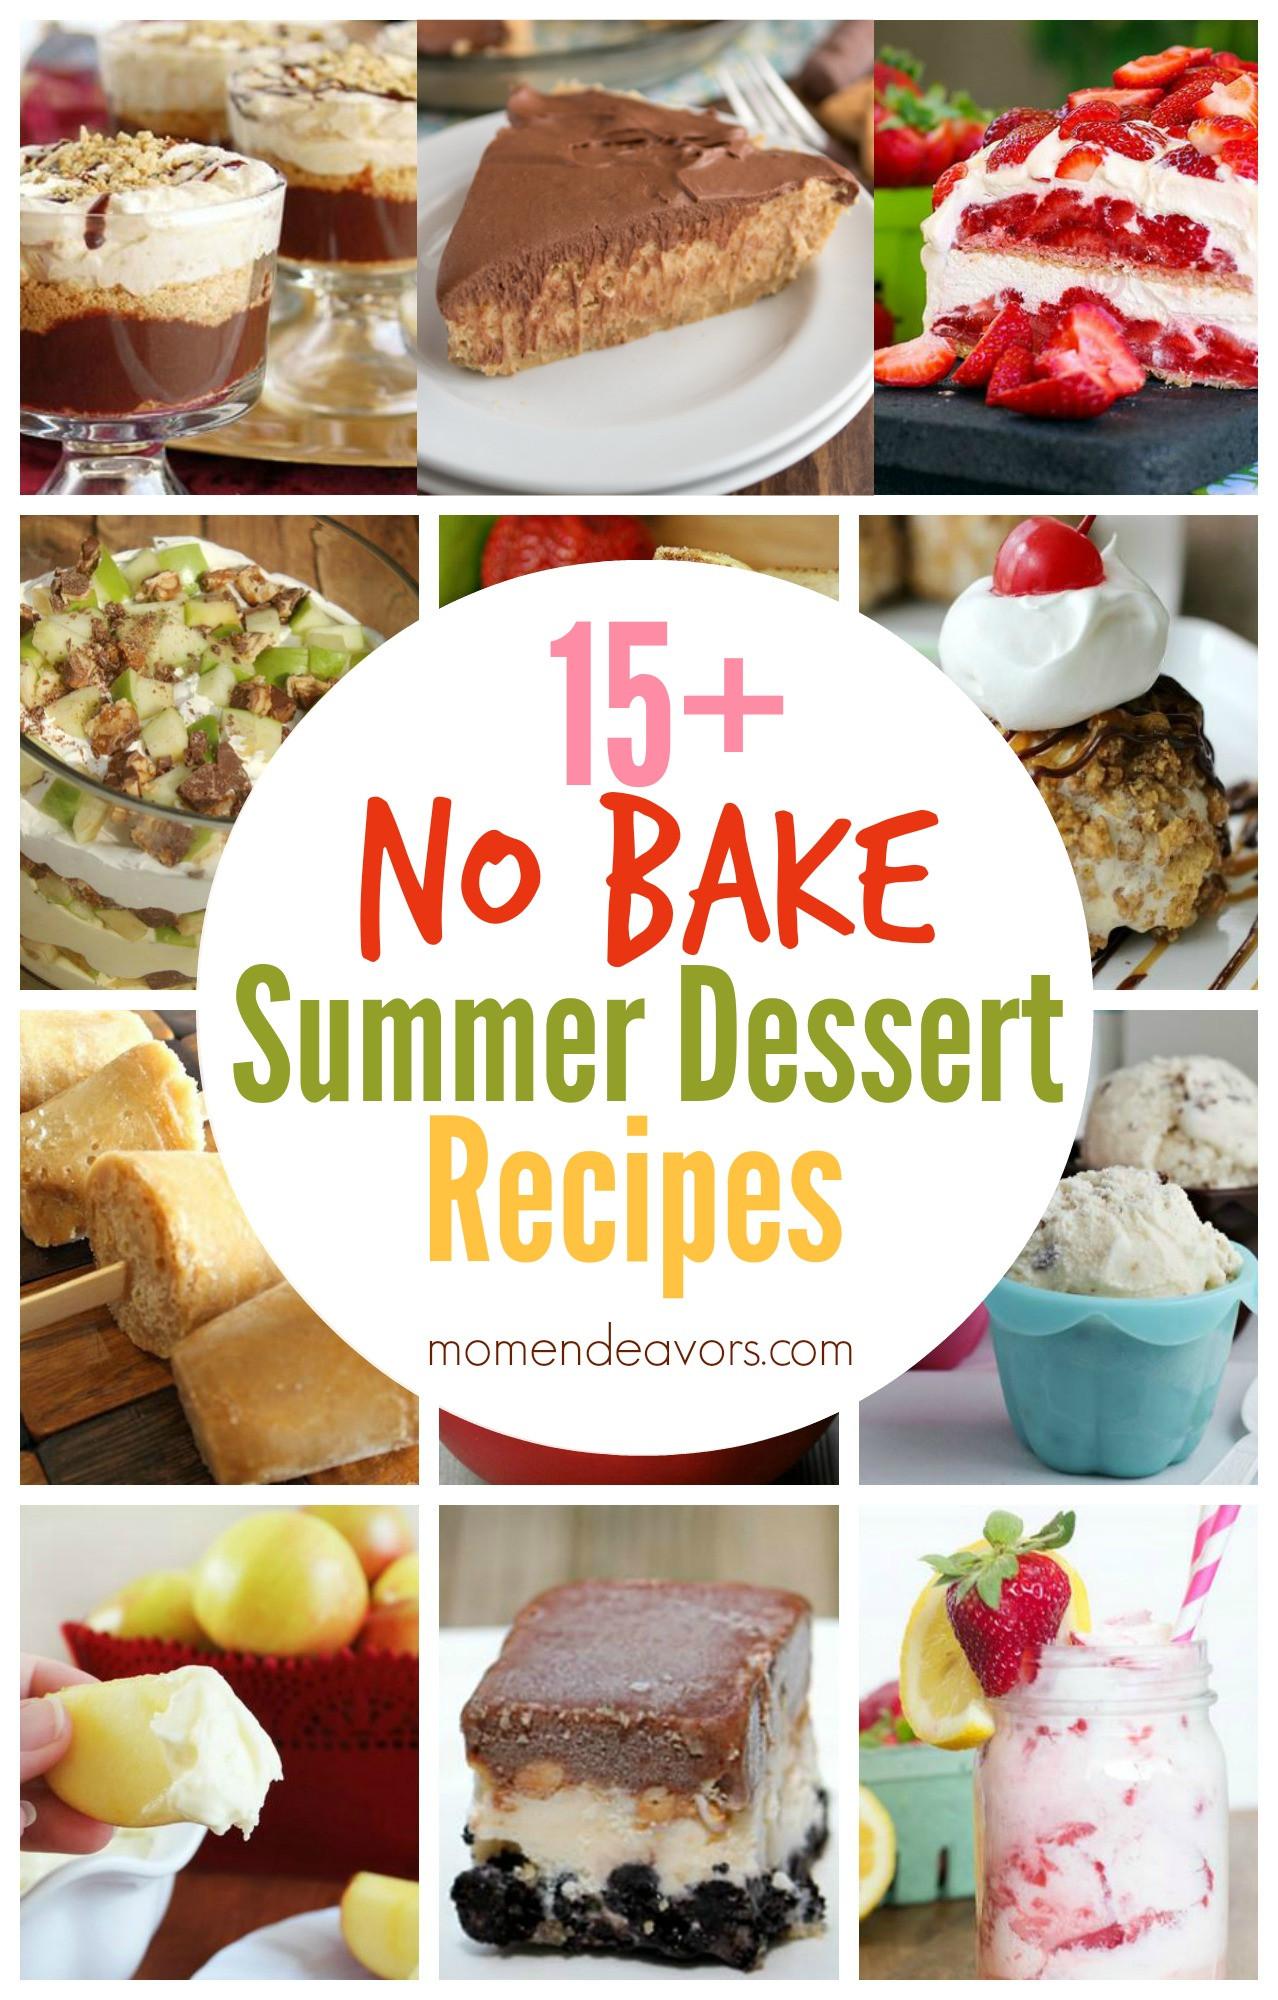 Summertime Desserts For A Crowd  15 No Bake Summer Dessert Recipes